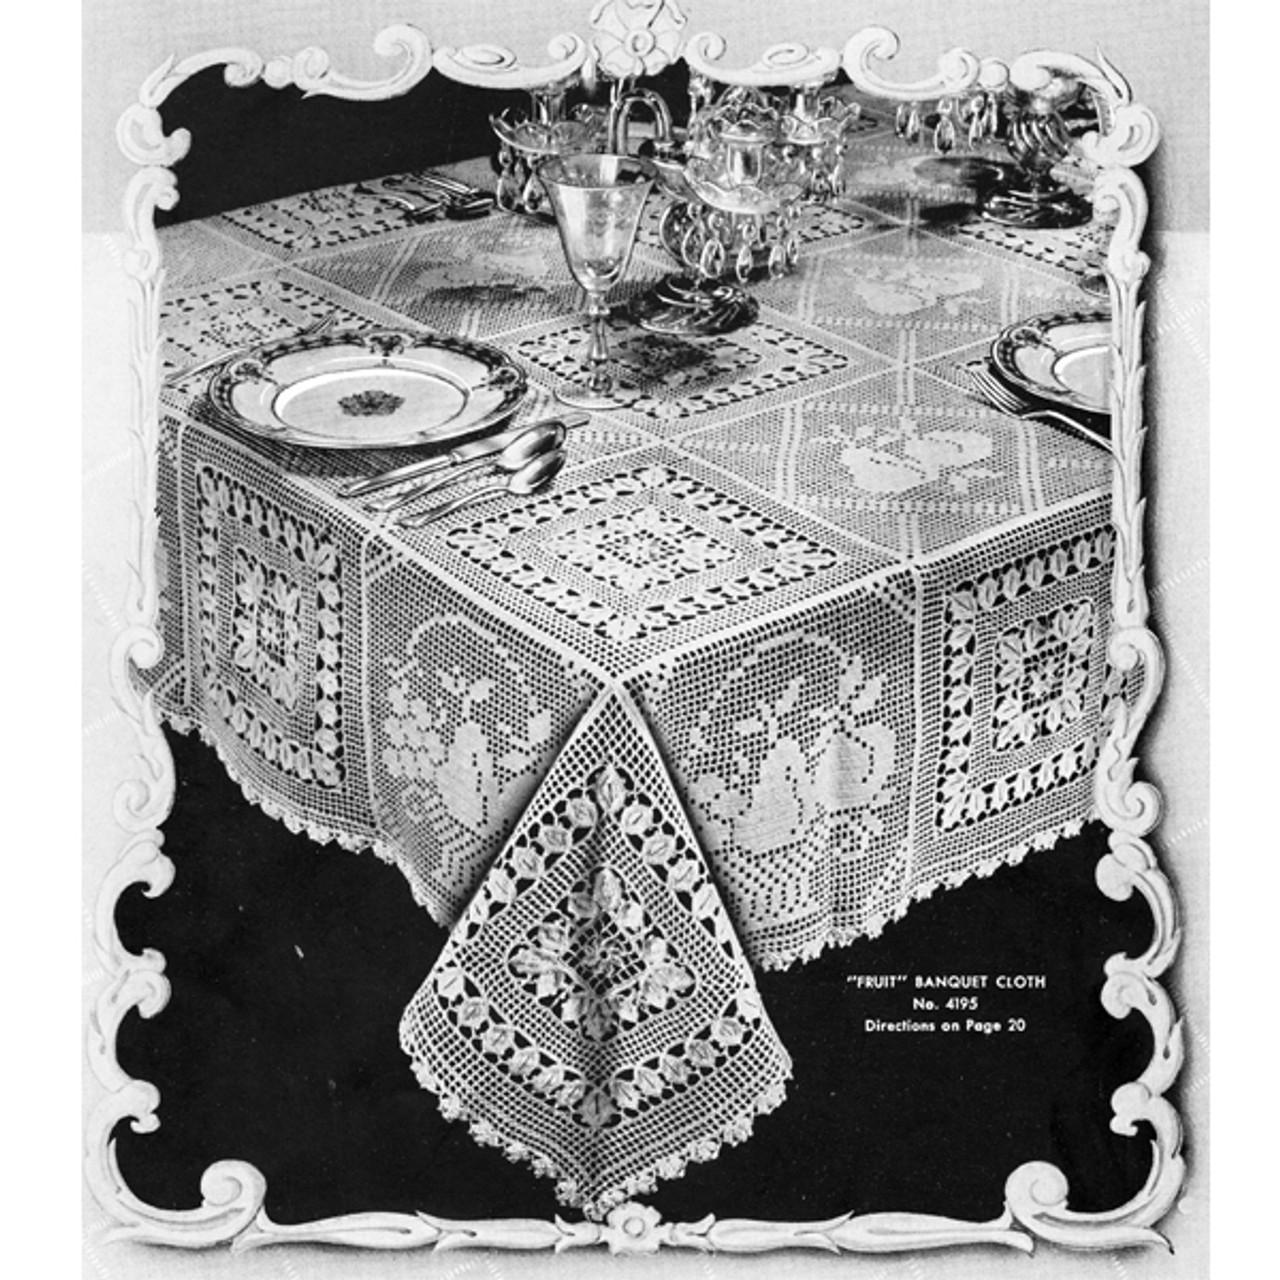 Vintage Filet Crochet Fruit Block Tablecloth Pattern